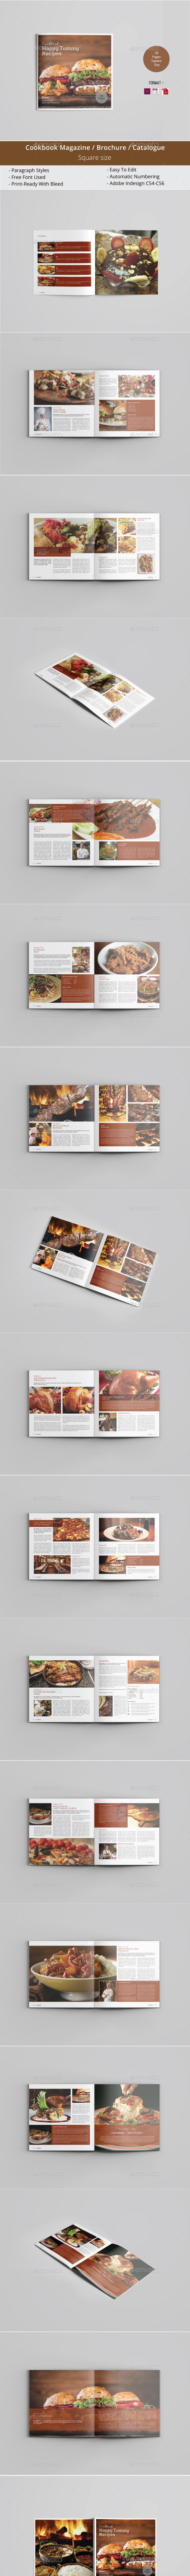 Square Cookbook magazine / Brochure Template - Magazines Print Templates